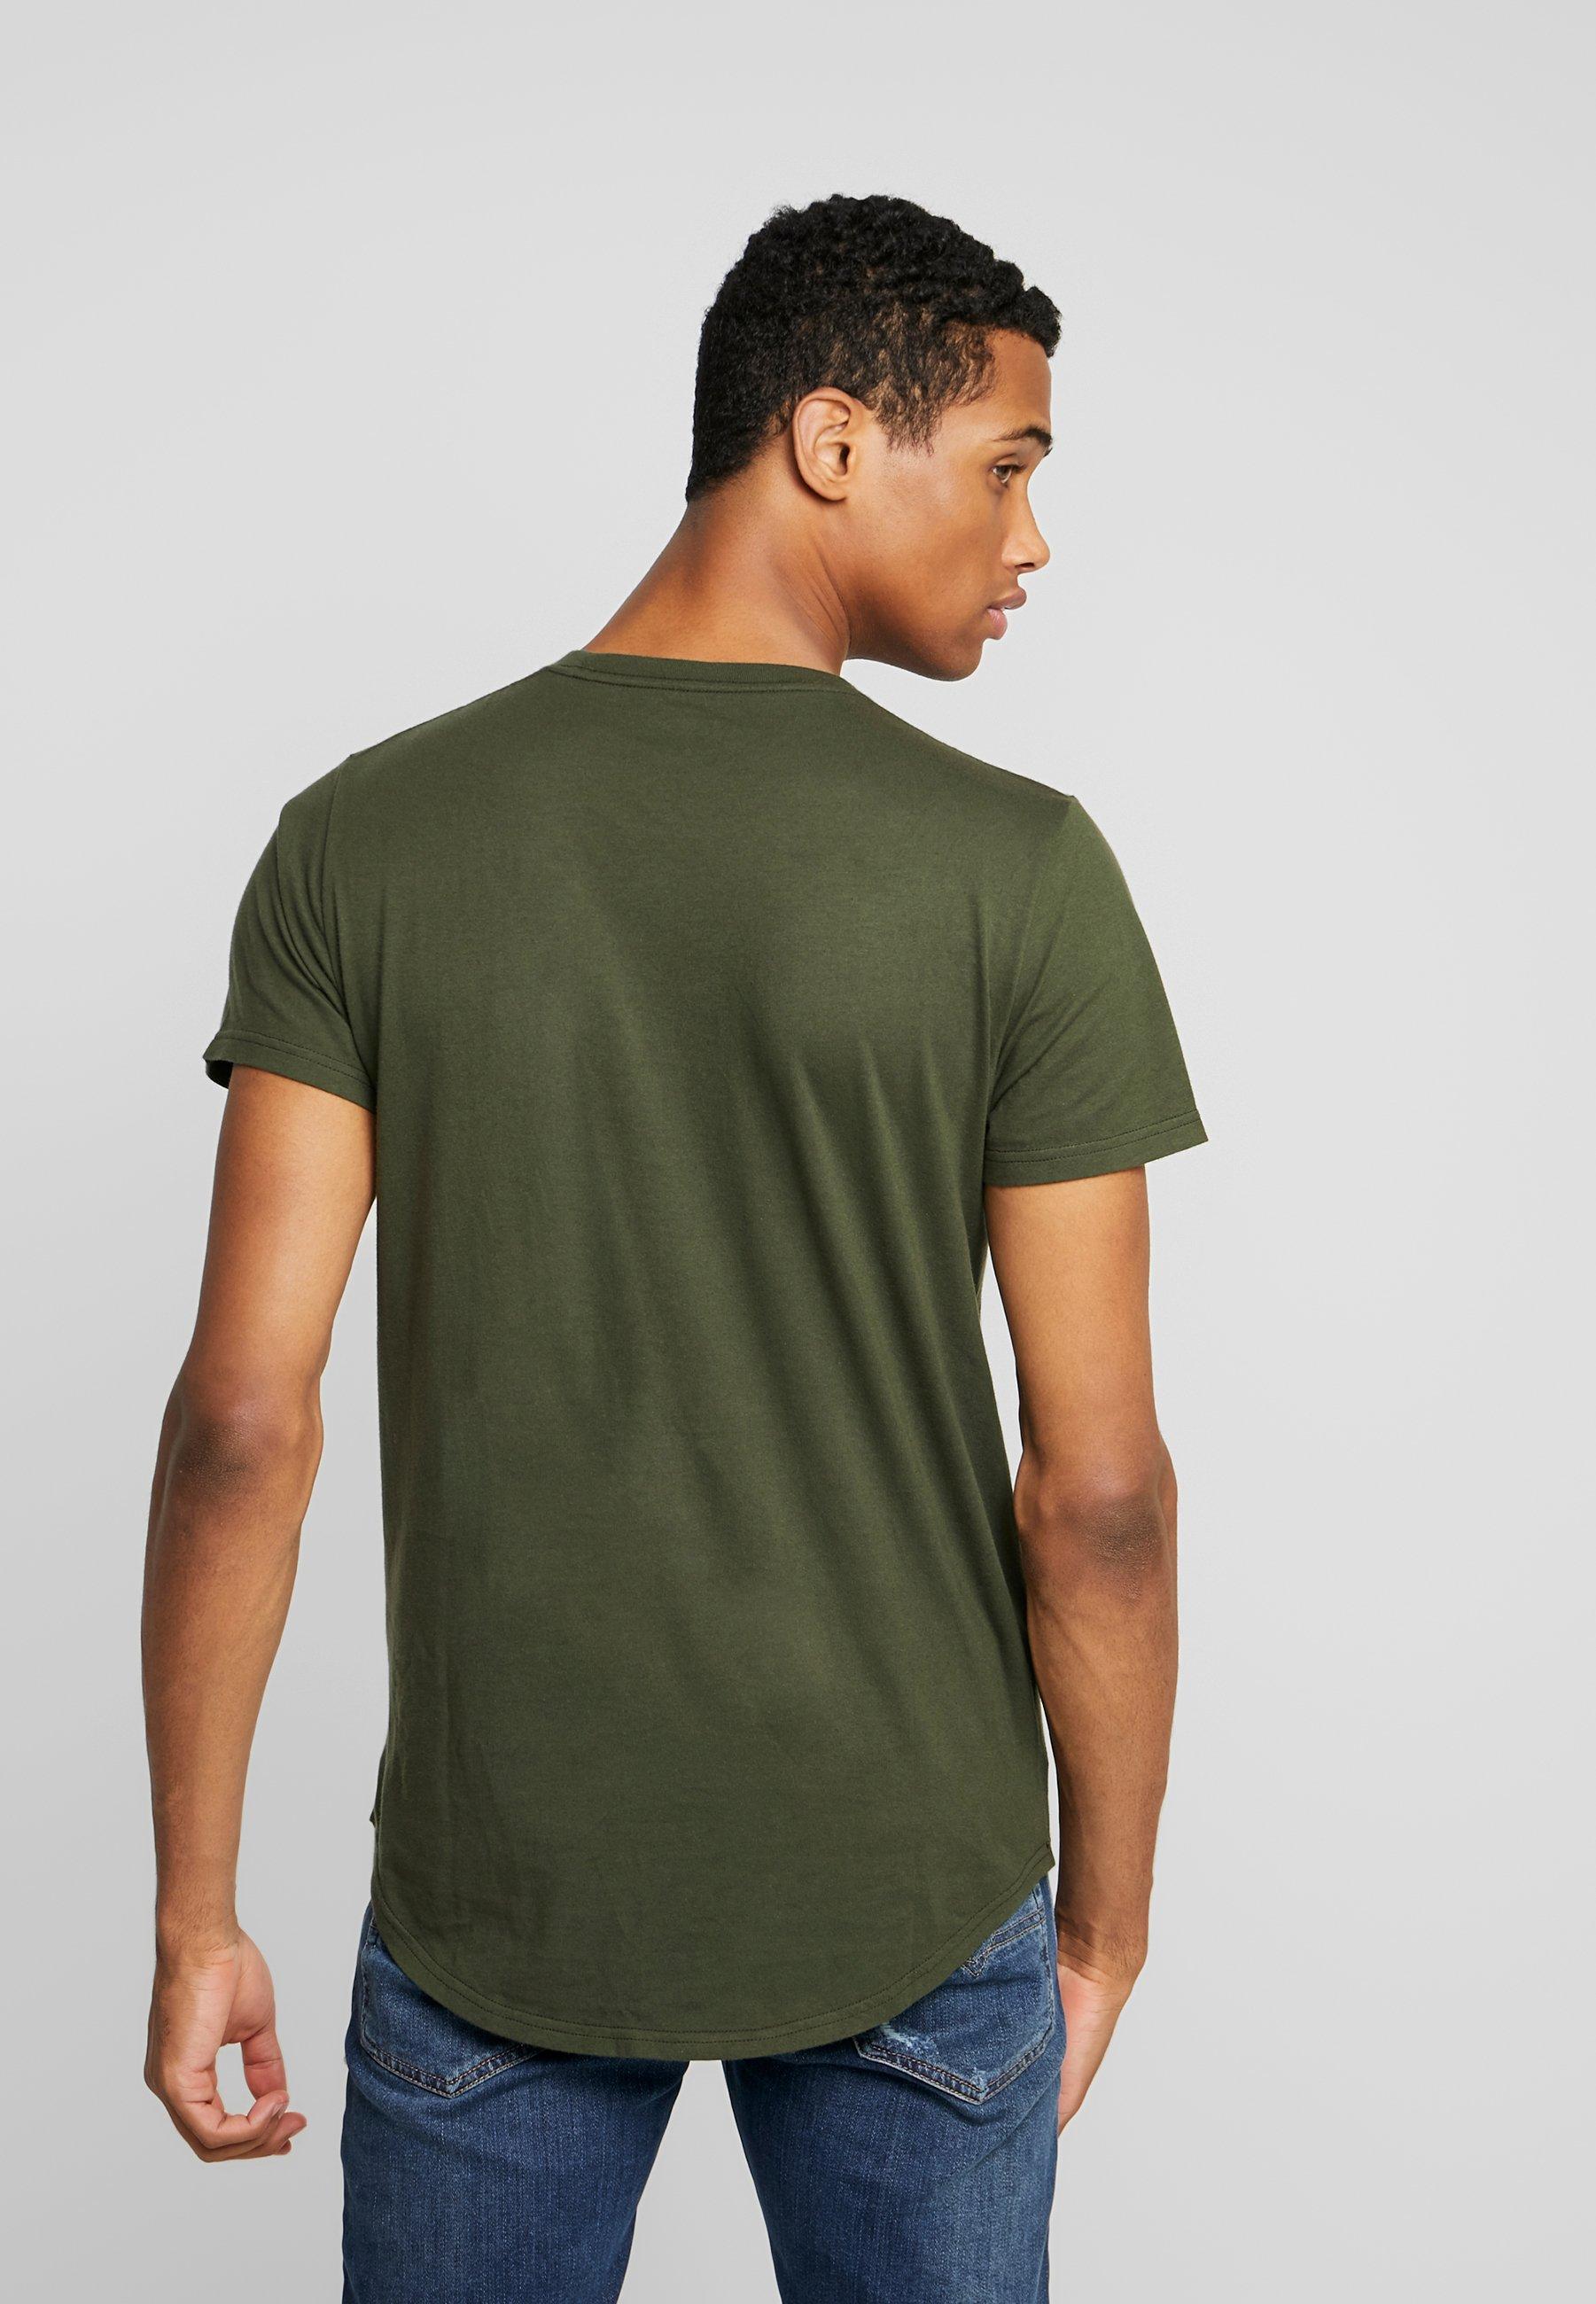 Green Stampa CoScrunch LogoT Box Con Hollister shirt FKJTl31cu